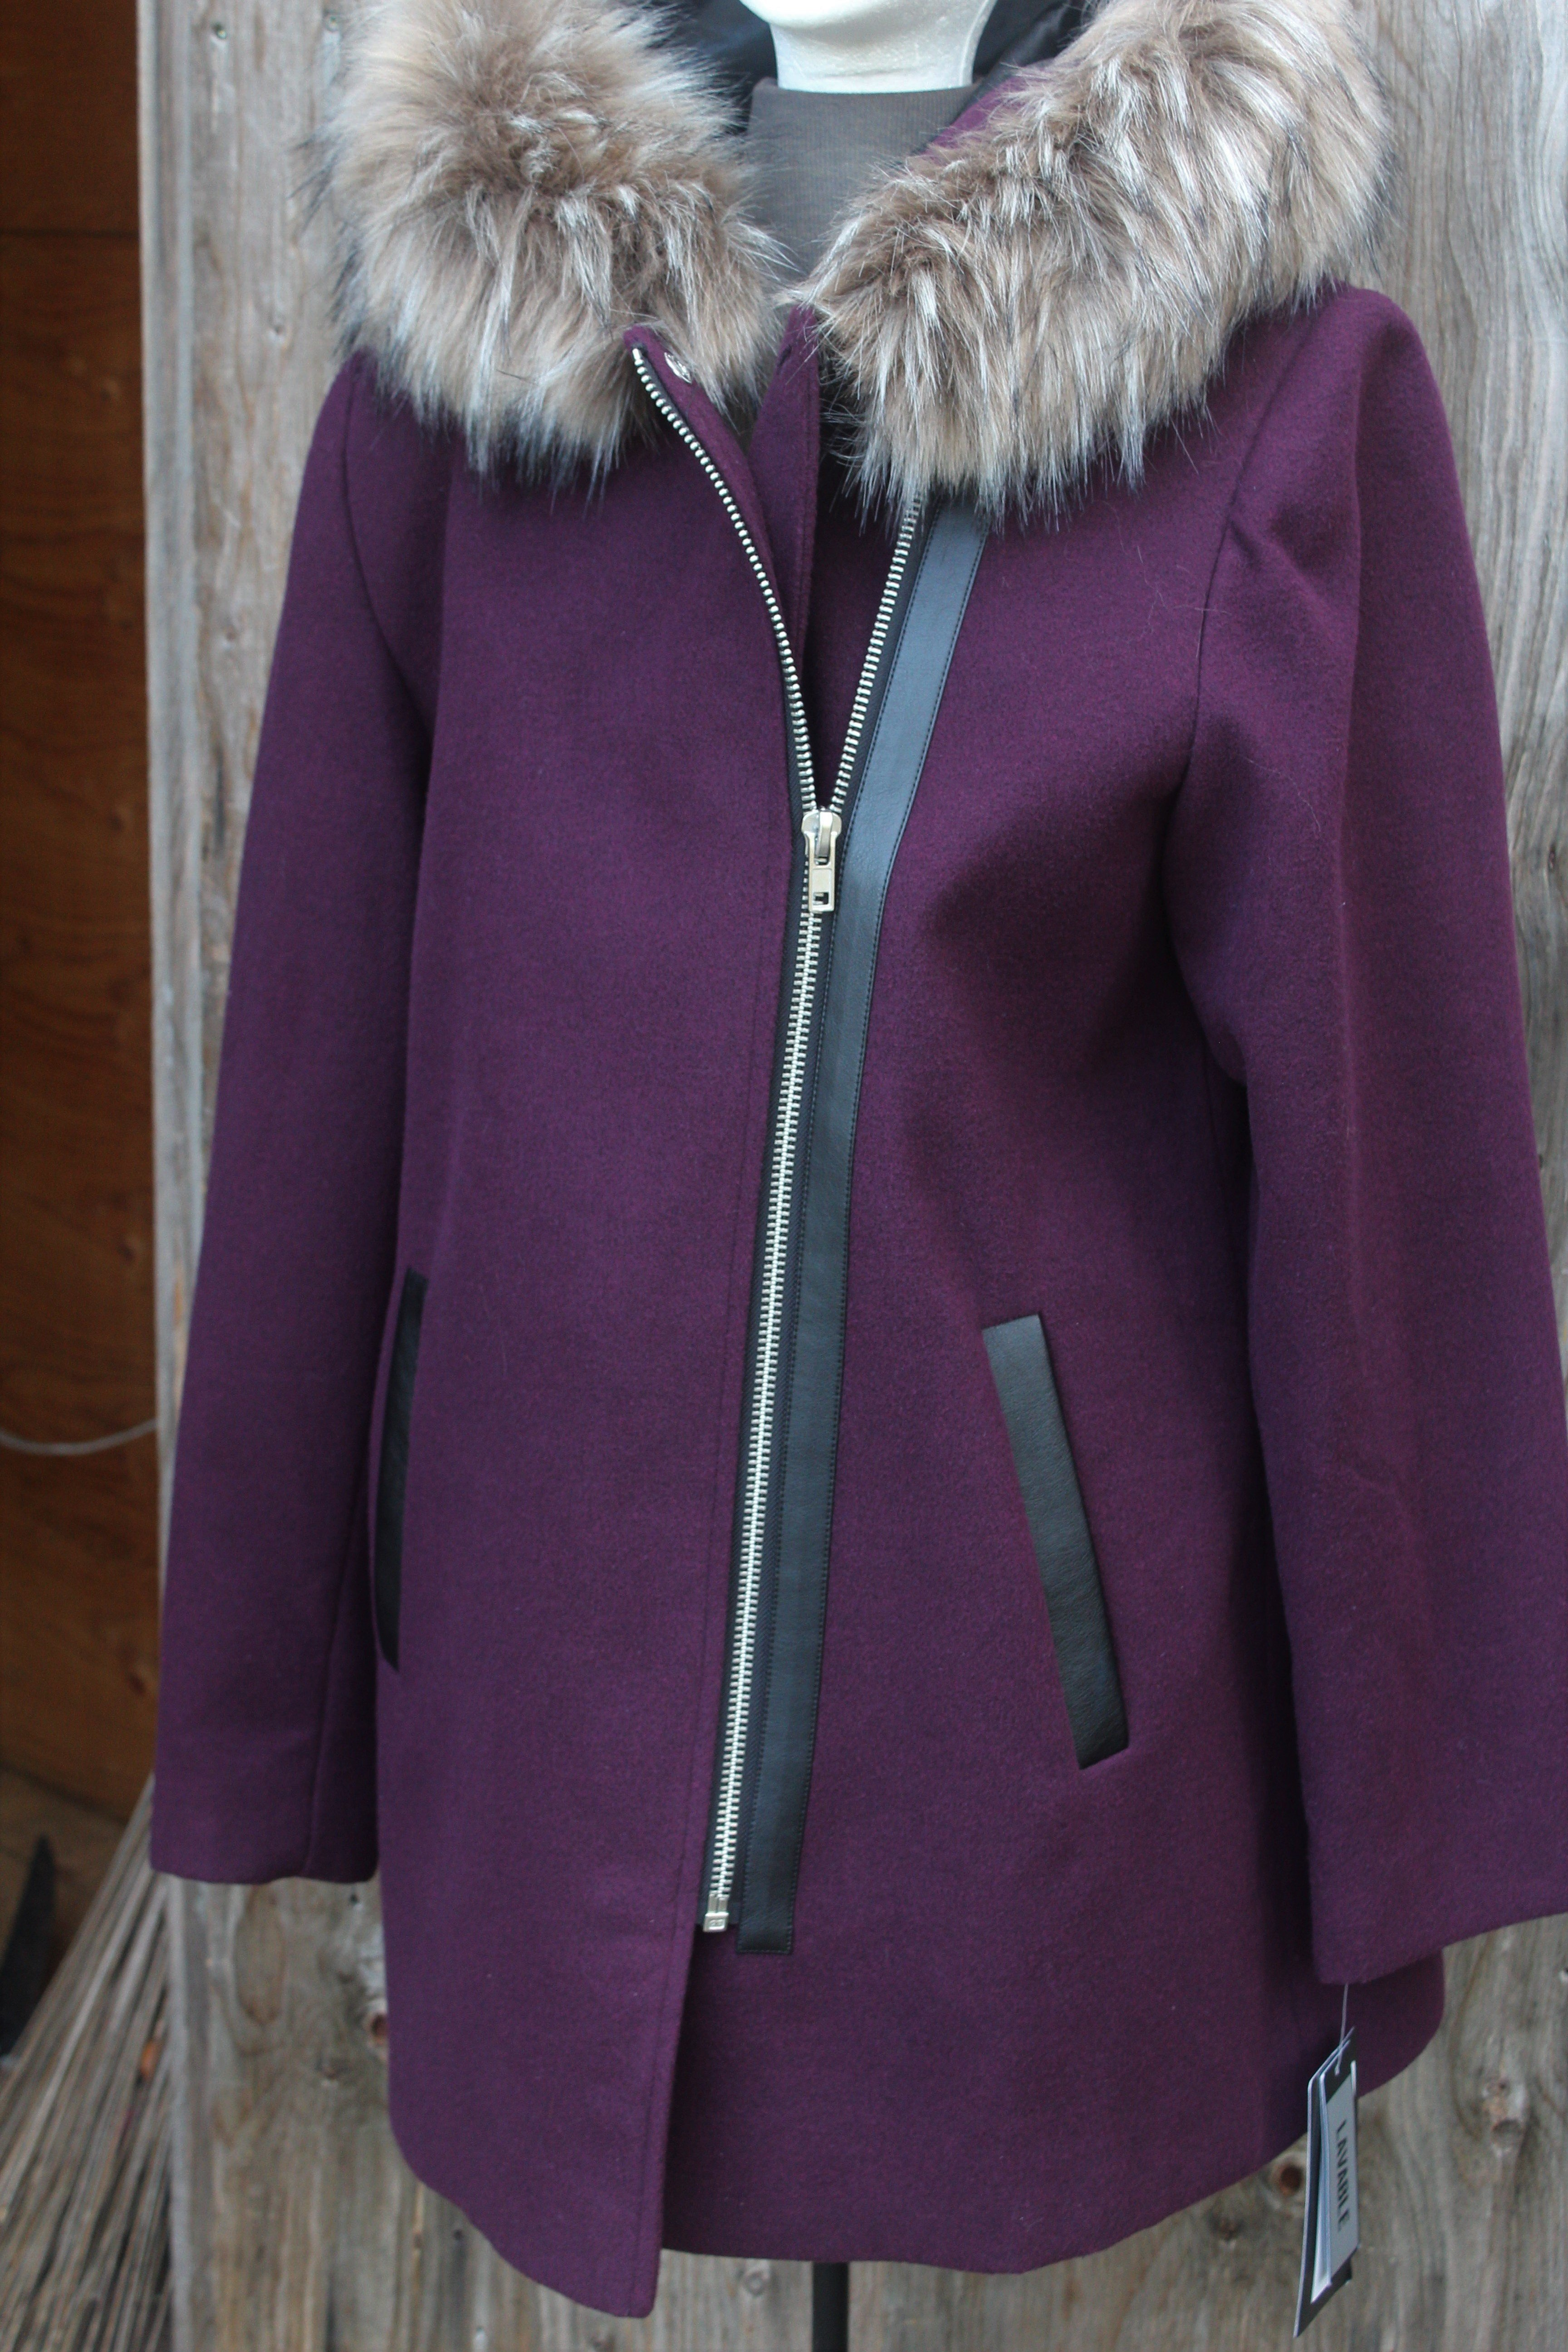 Merlot- $200.00 Niccolini: Style #A1013PM